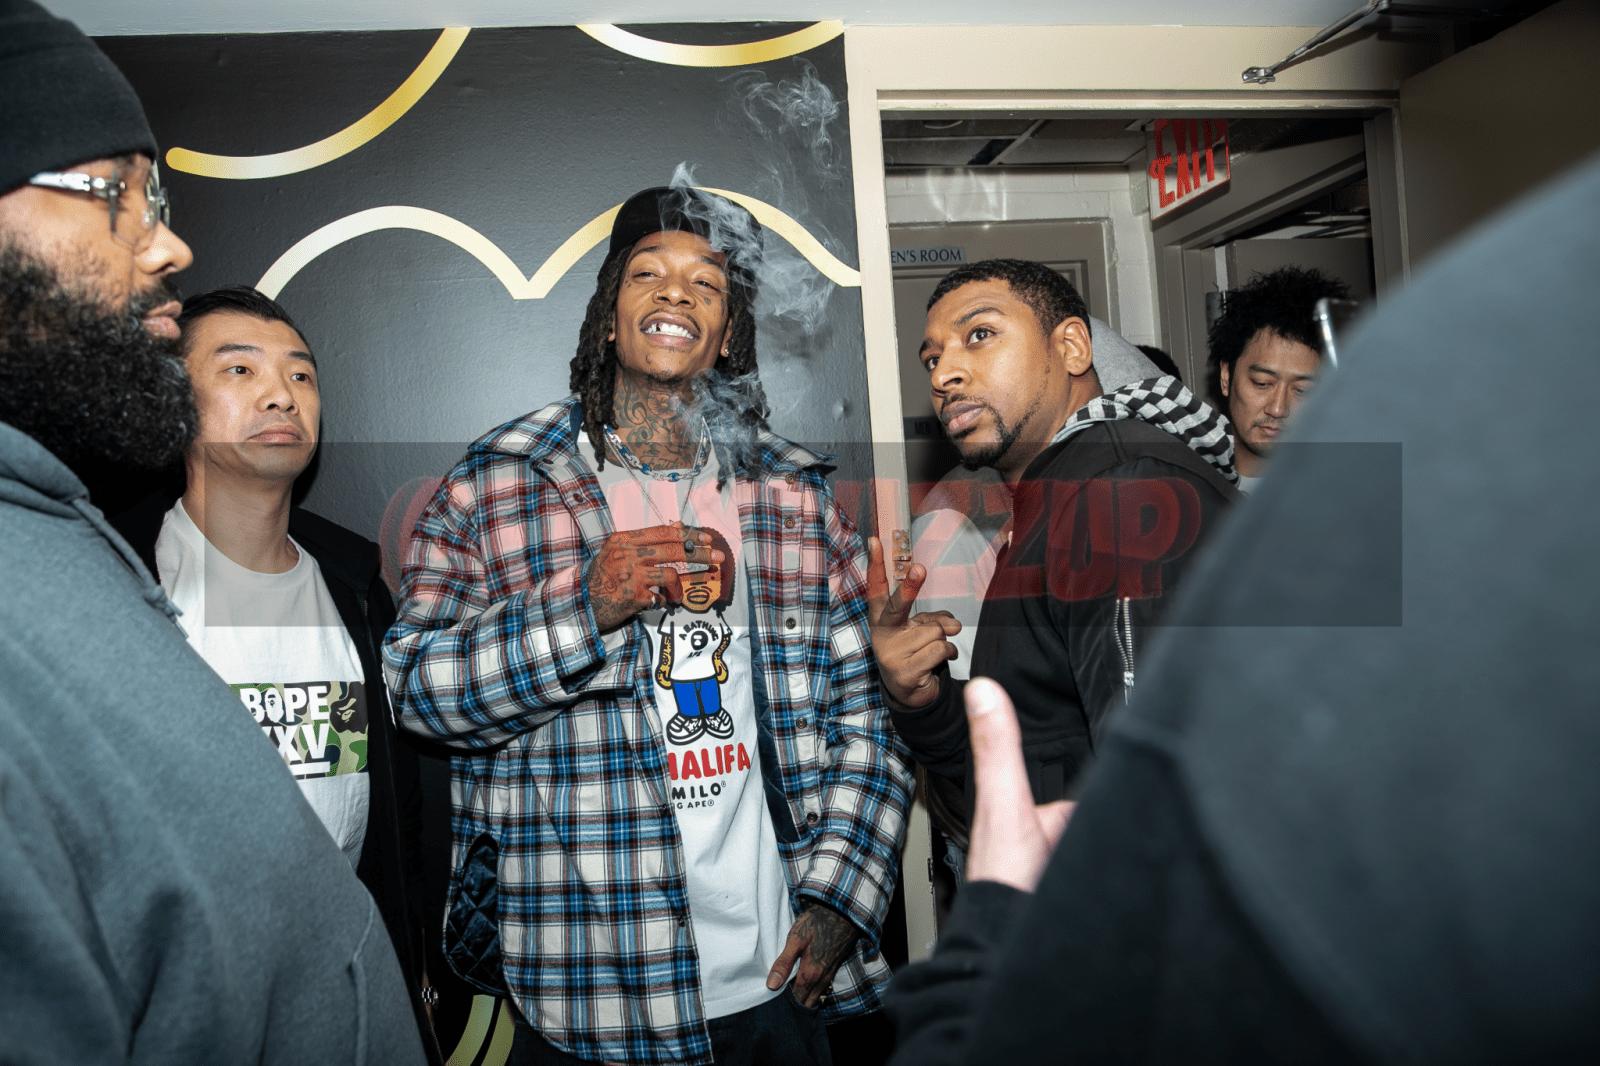 BAPE celebrates 25 years w/ Kid Cudi, Pusha T, Big Sean, Wiz Khalifa and Lil Yachty [Event Recap Photos]